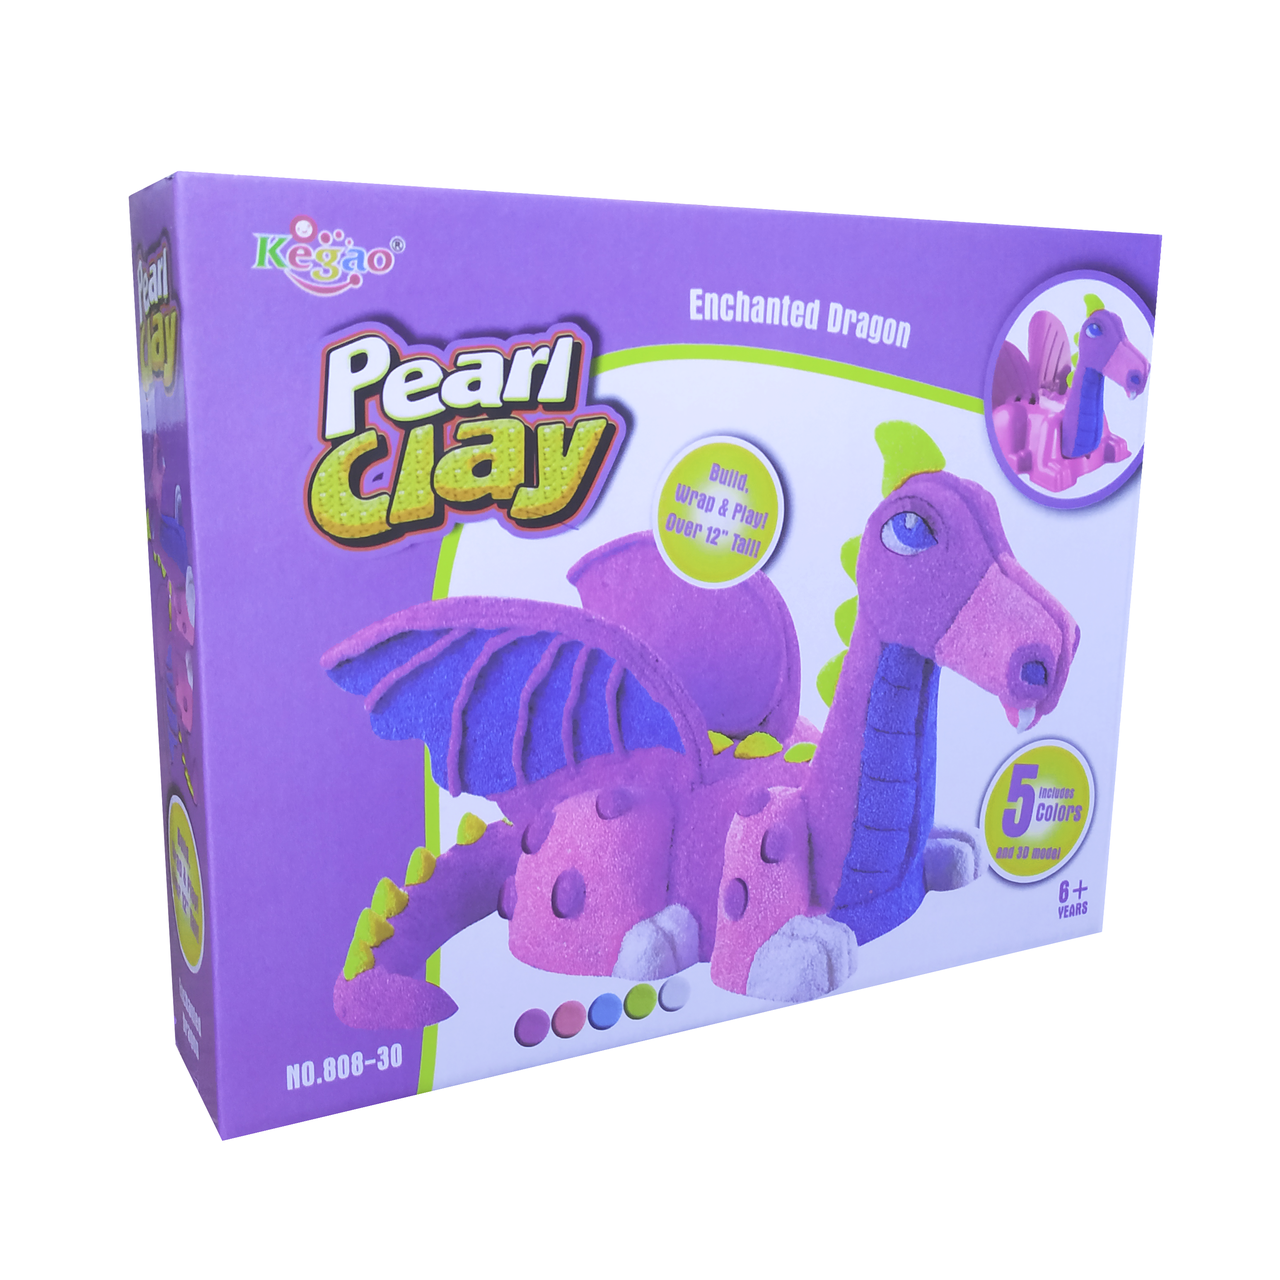 "Детский набор для лепки (шариковый пластилин) ""Pearl clay"""